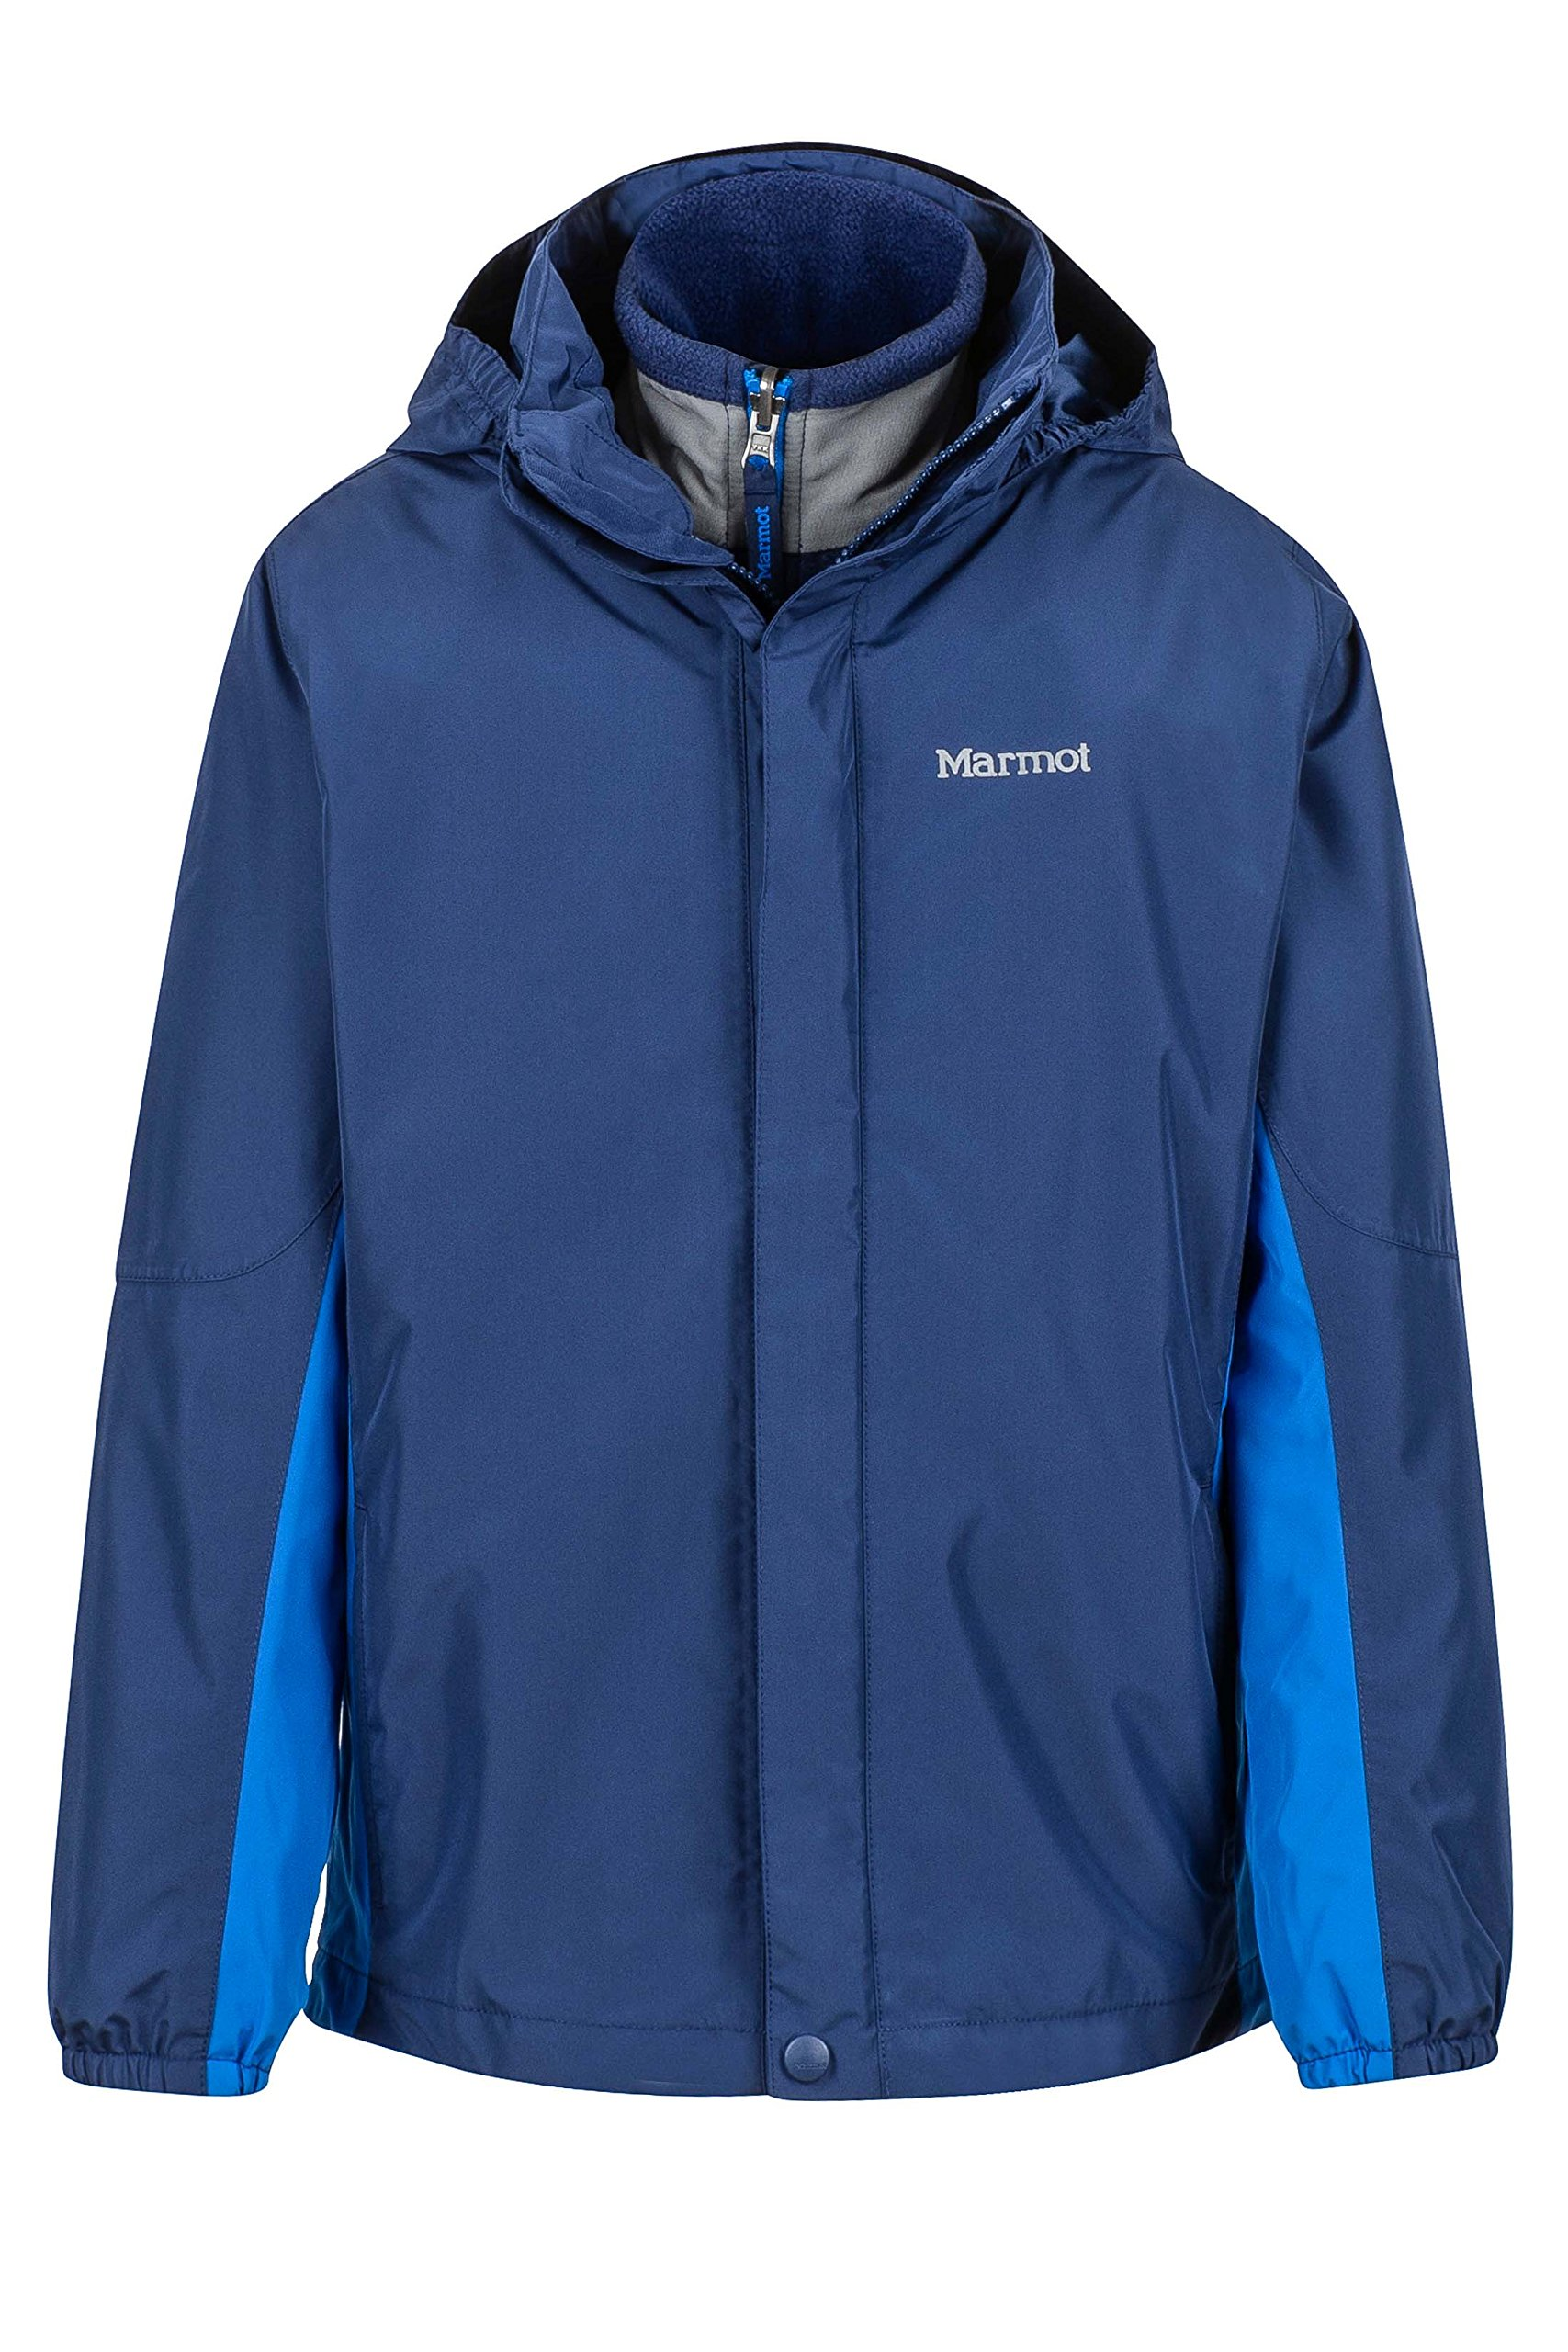 Marmot Northshore Boys' Waterproof Hooded Rain Jacket with Removable Fleece Liner, Arctic Navy/True Blue, X-Large